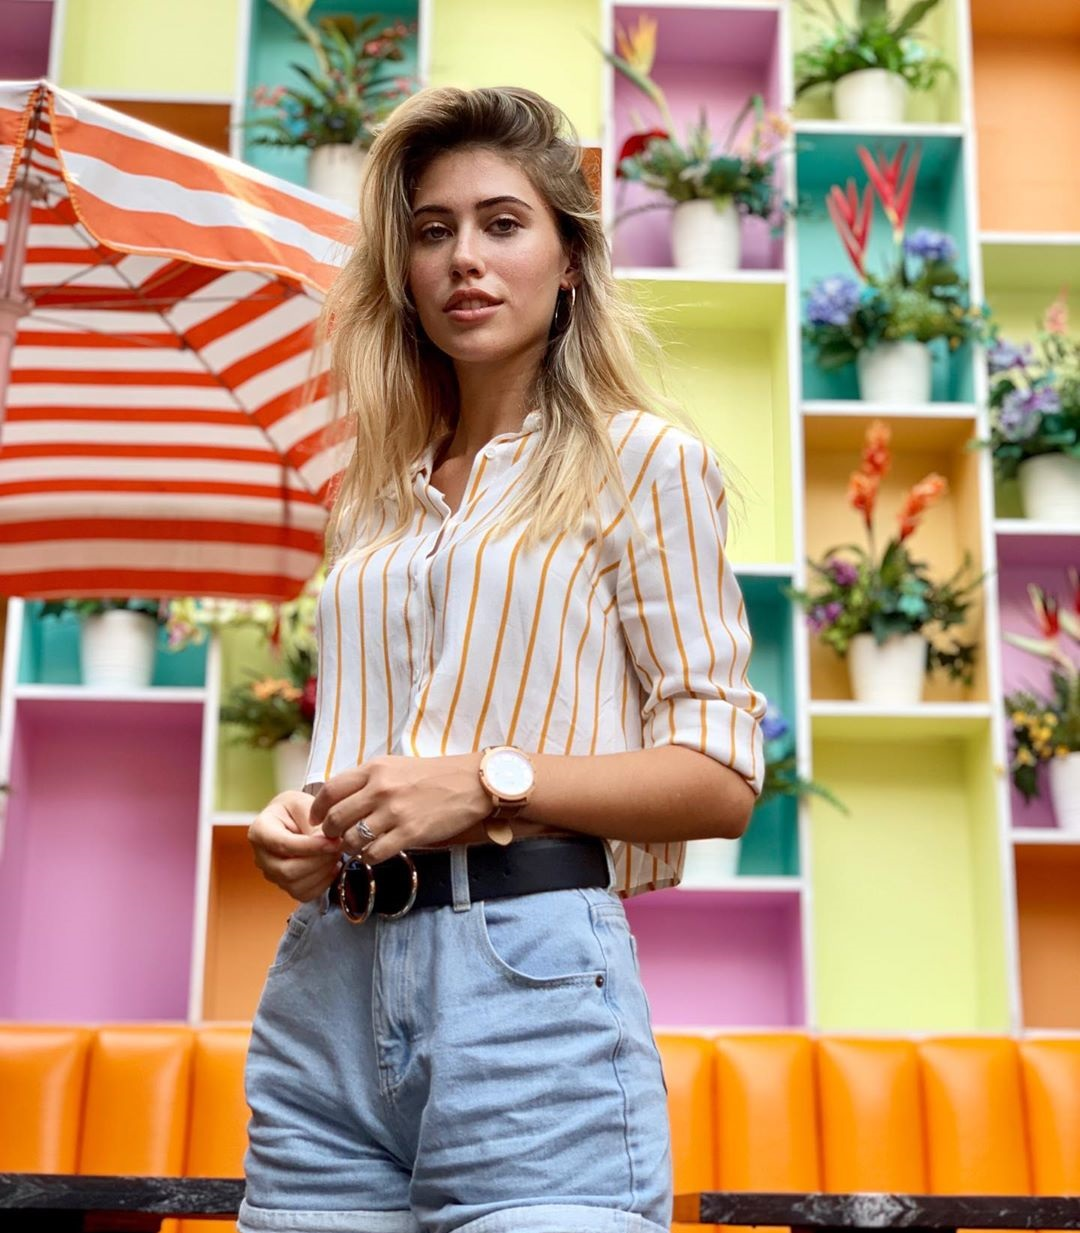 Nikki-Murciano-Wallpapers-Insta-Fit-Bio-2